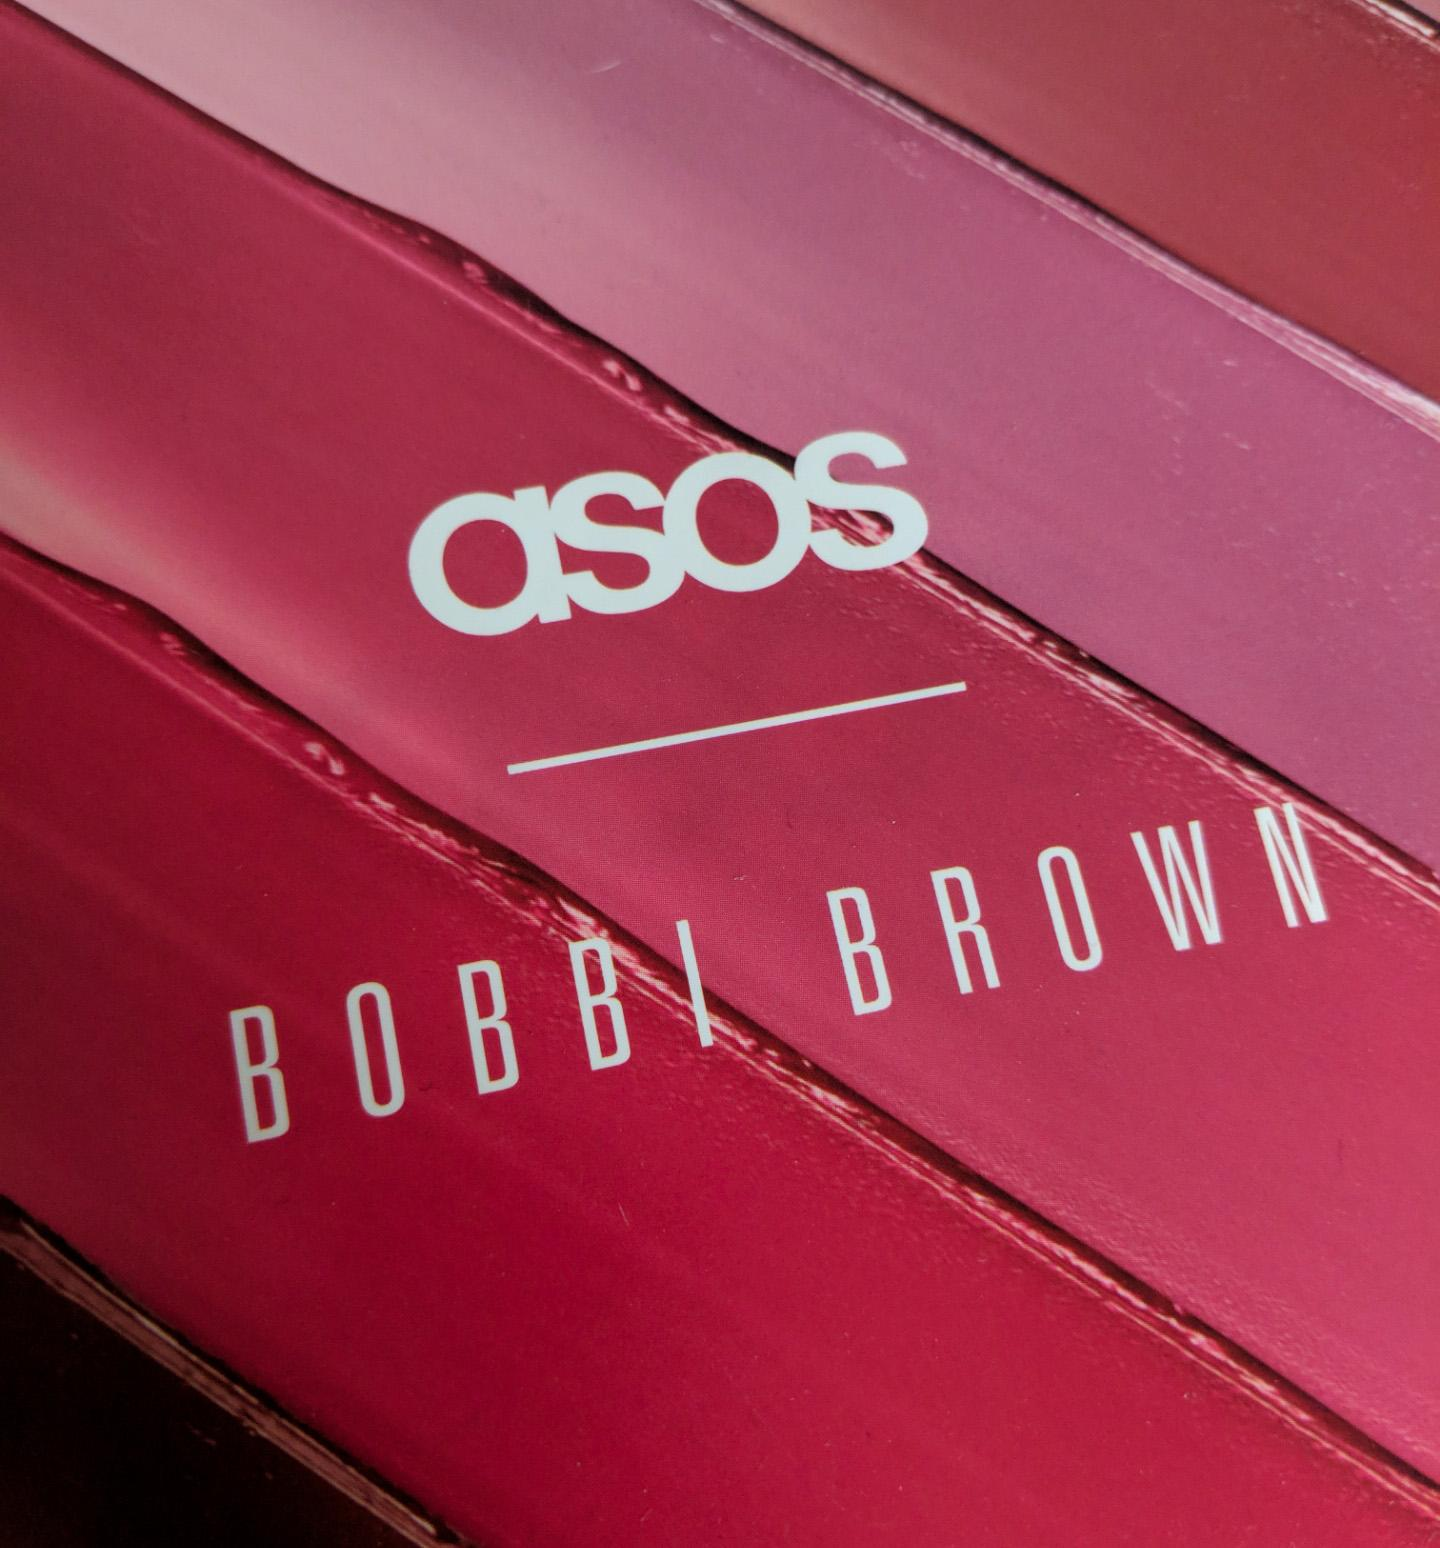 ASOS Bobbi Brown Box